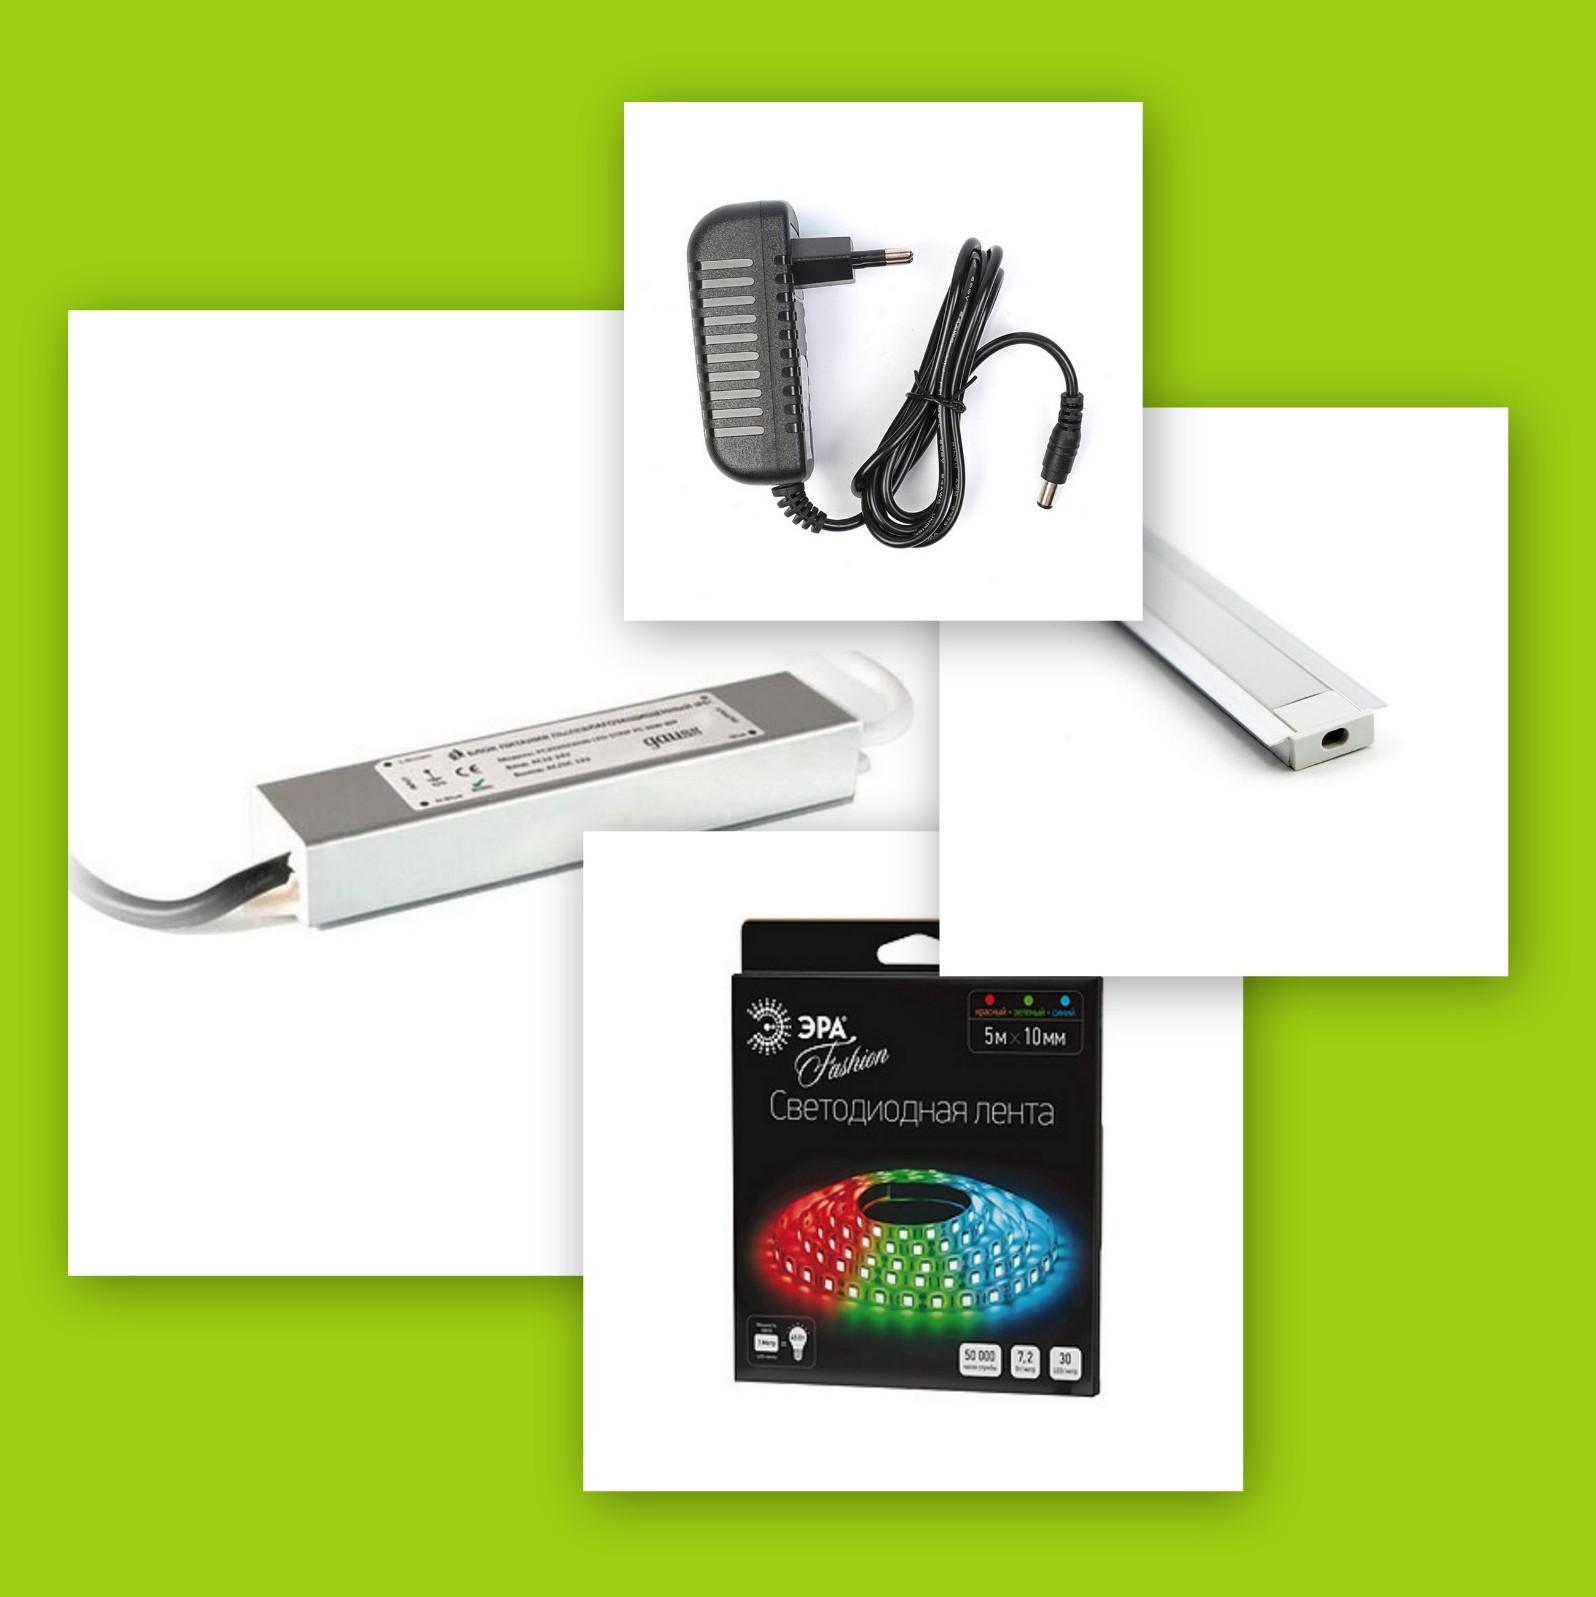 Ленты LED и адаптеры питания